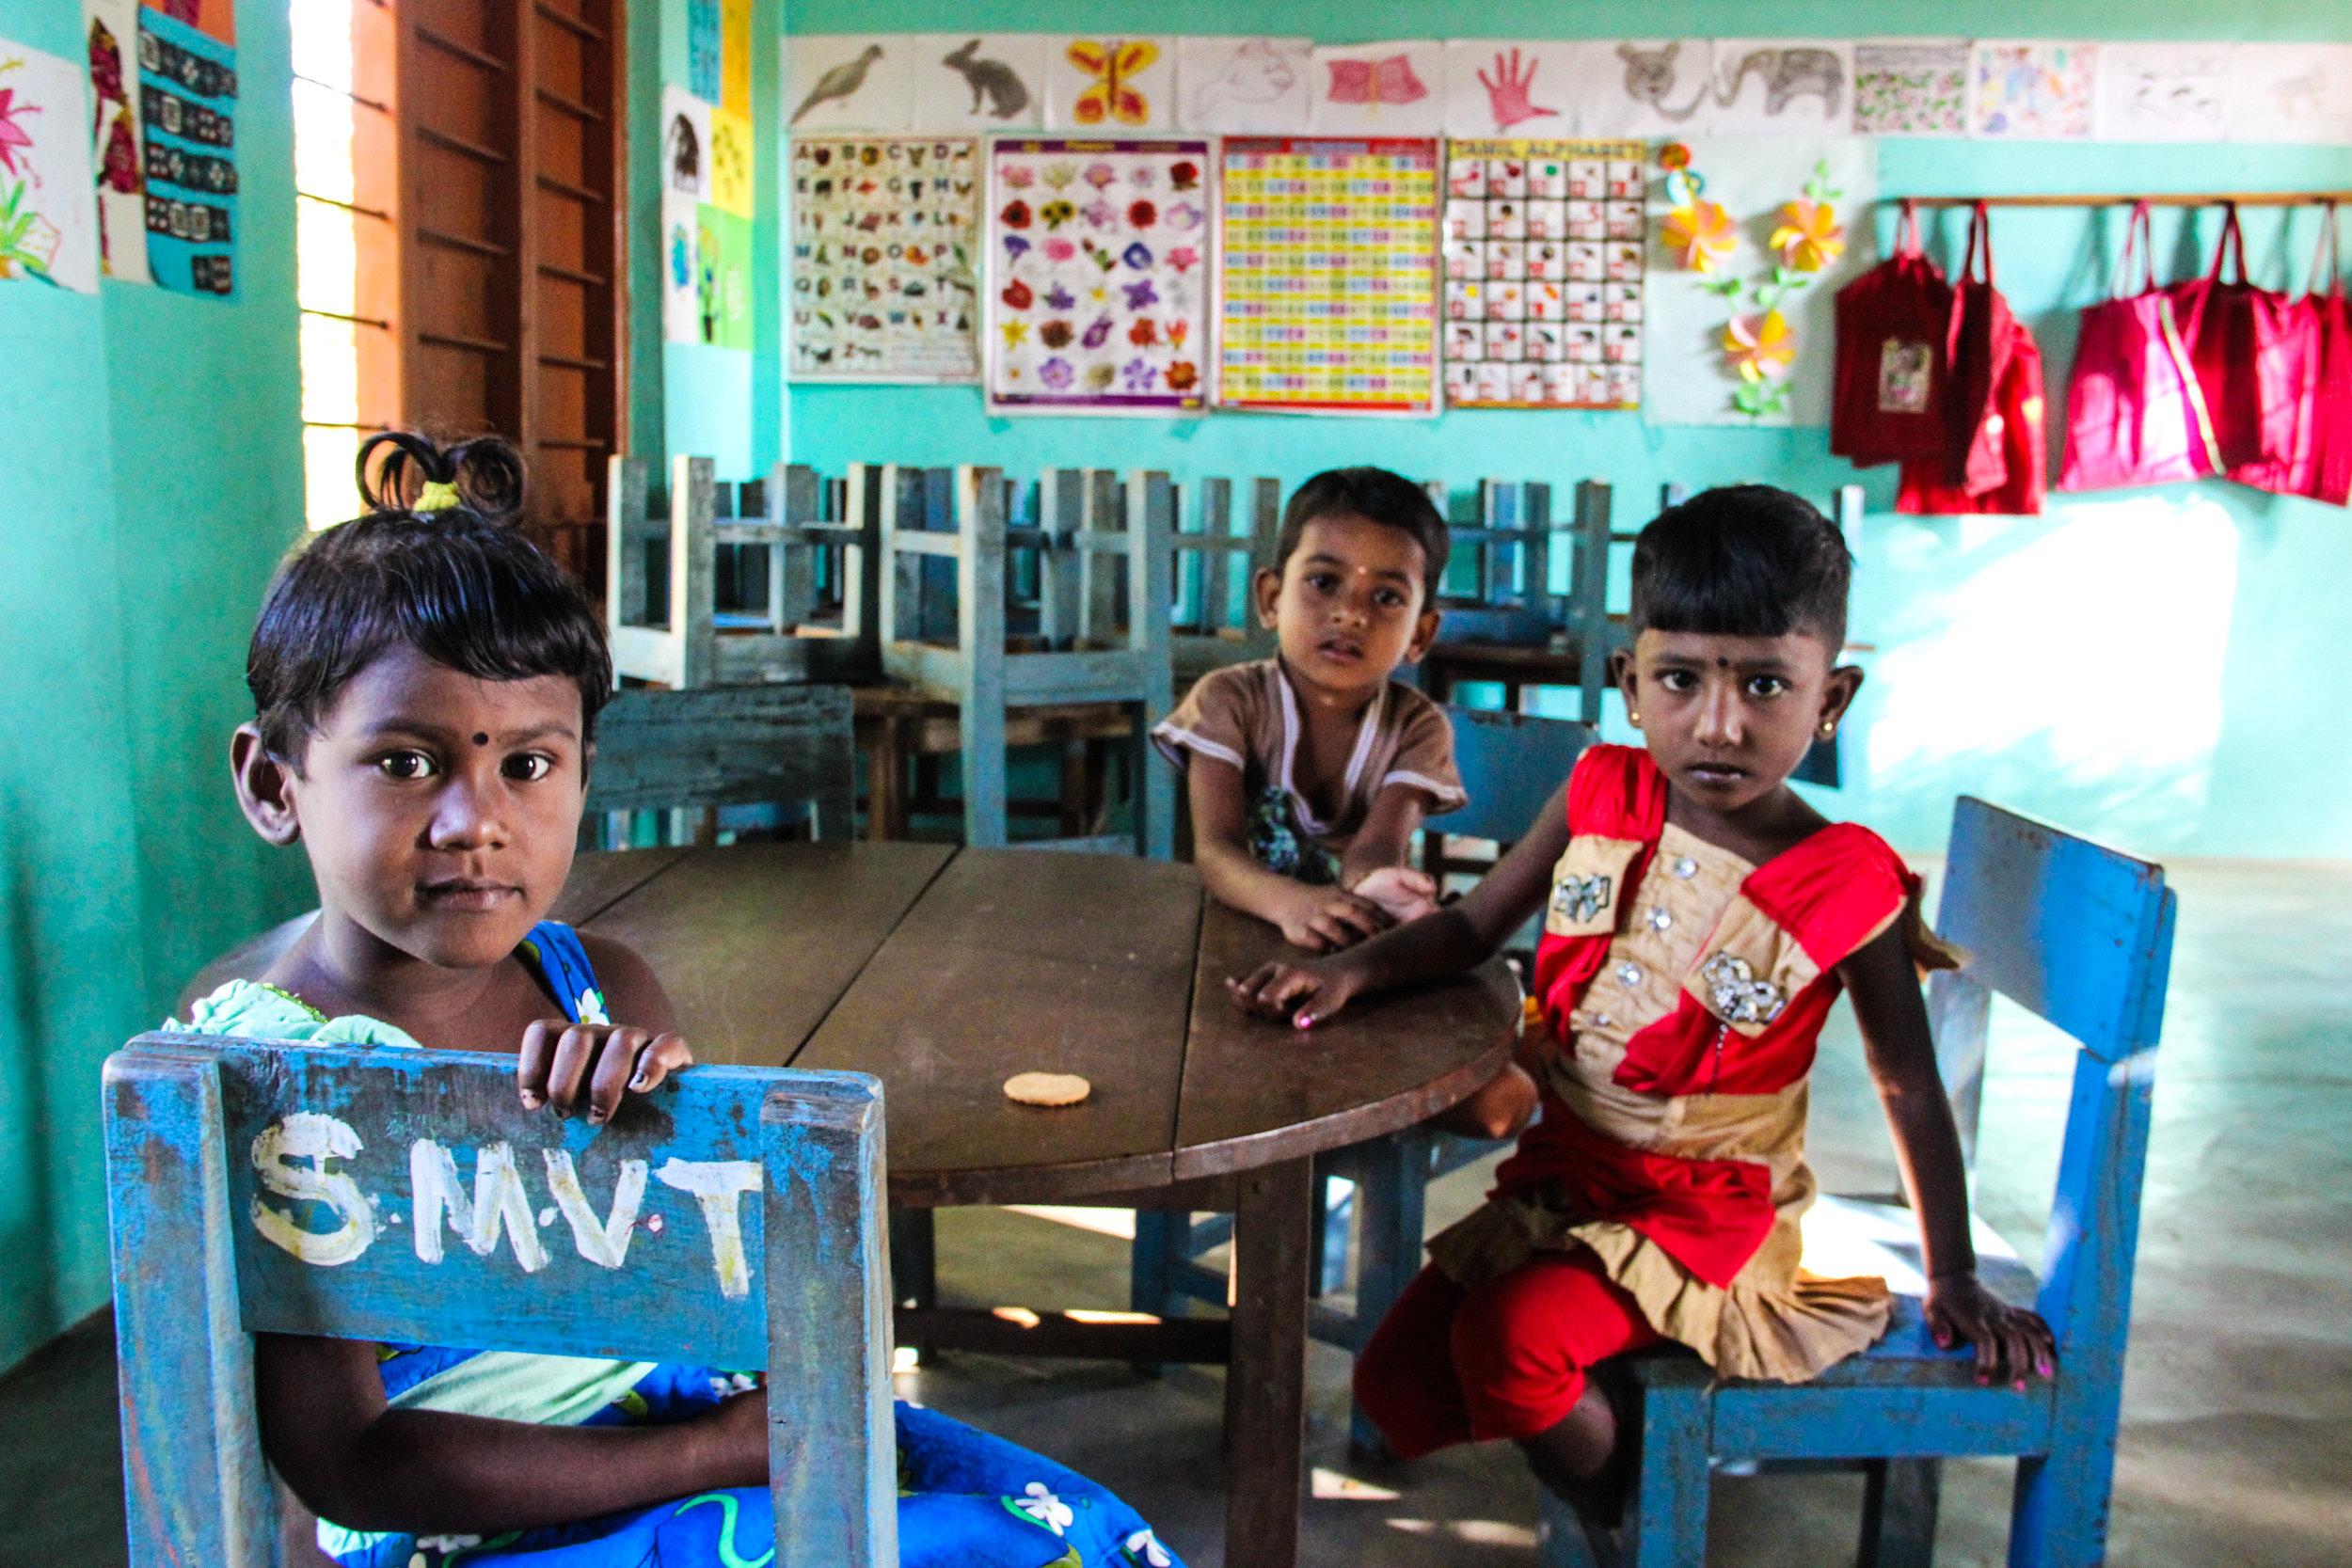 Students at school-4710.jpg